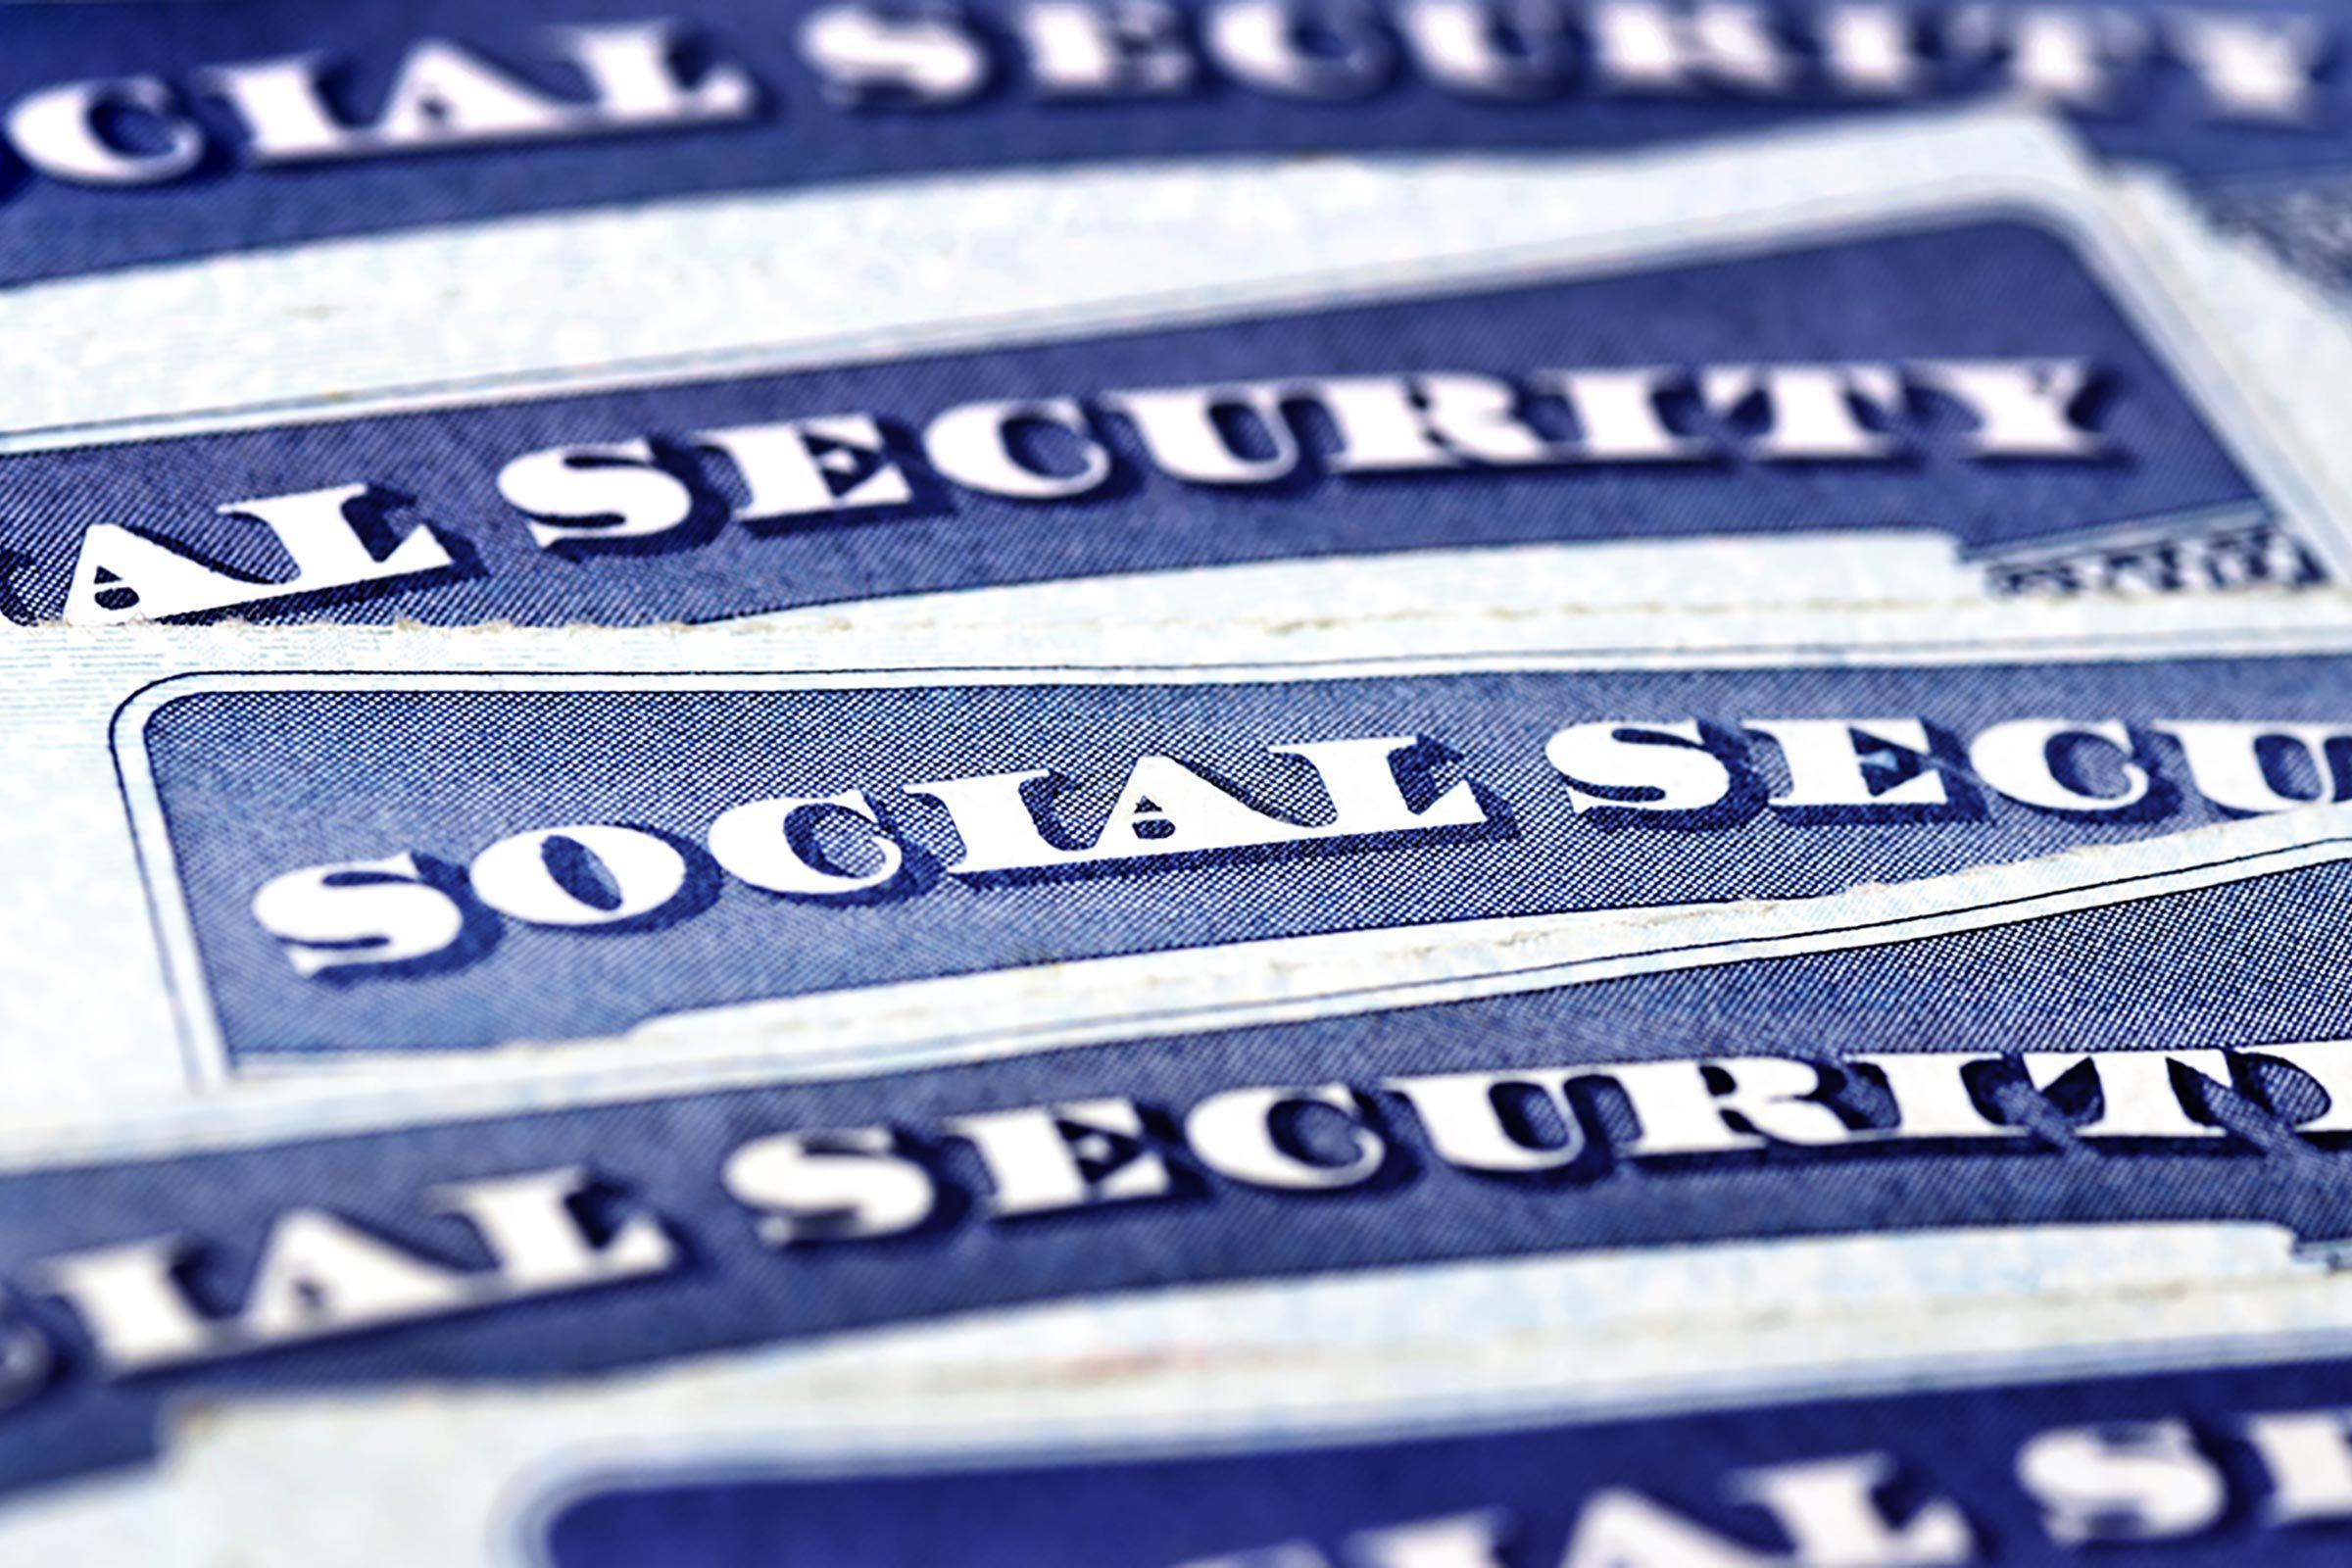 a89b0fe783aa171576c411640941a9cb - How To Get A Brand New Social Security Number